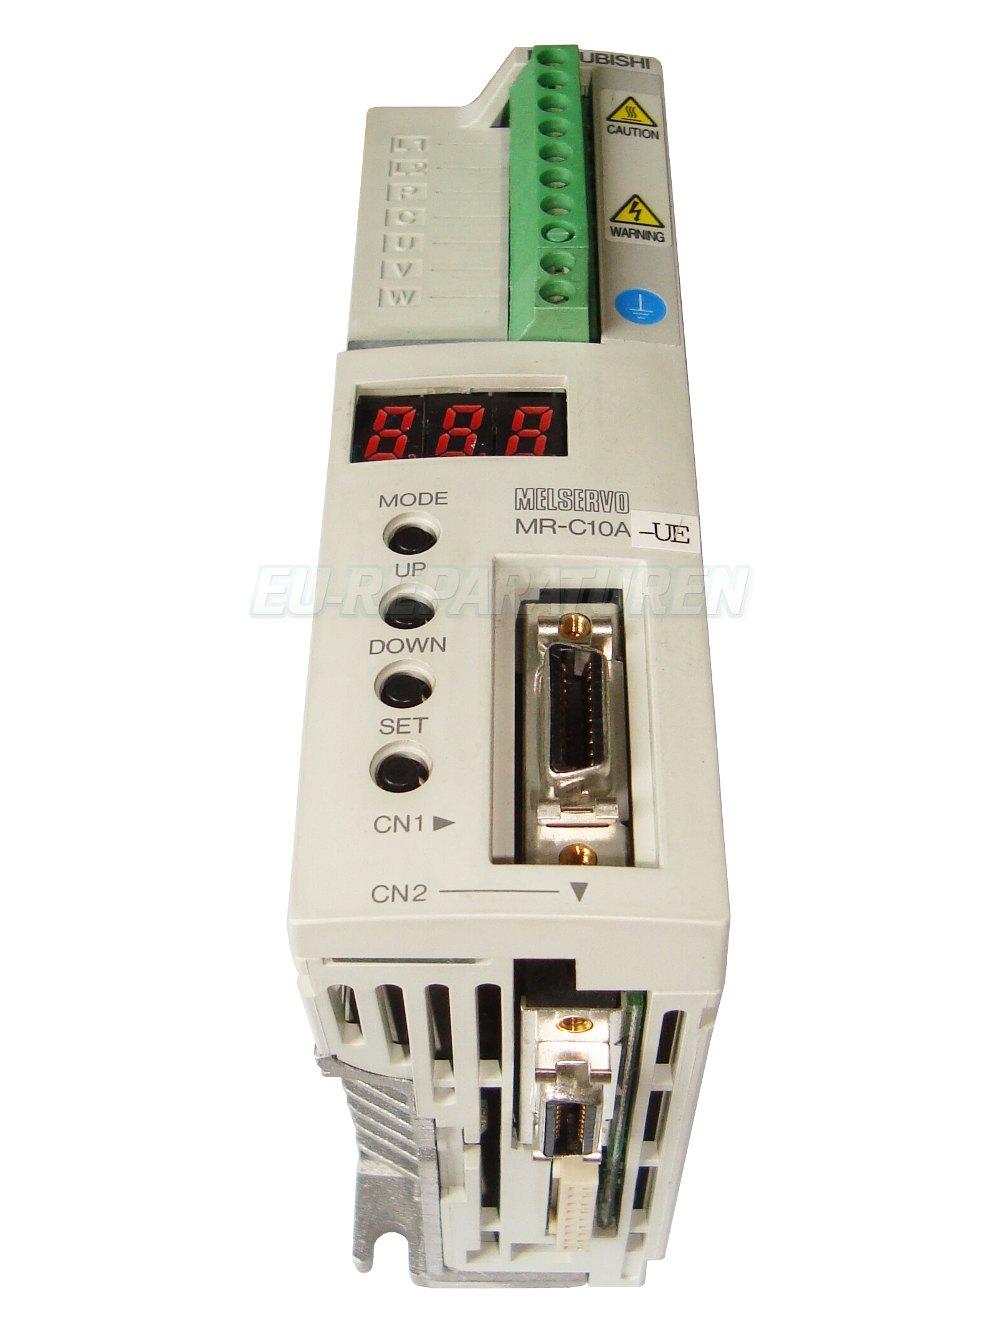 SHOP, Kaufen: MITSUBISHI ELECTRIC MR-C10A-UE FREQUENZUMFORMER